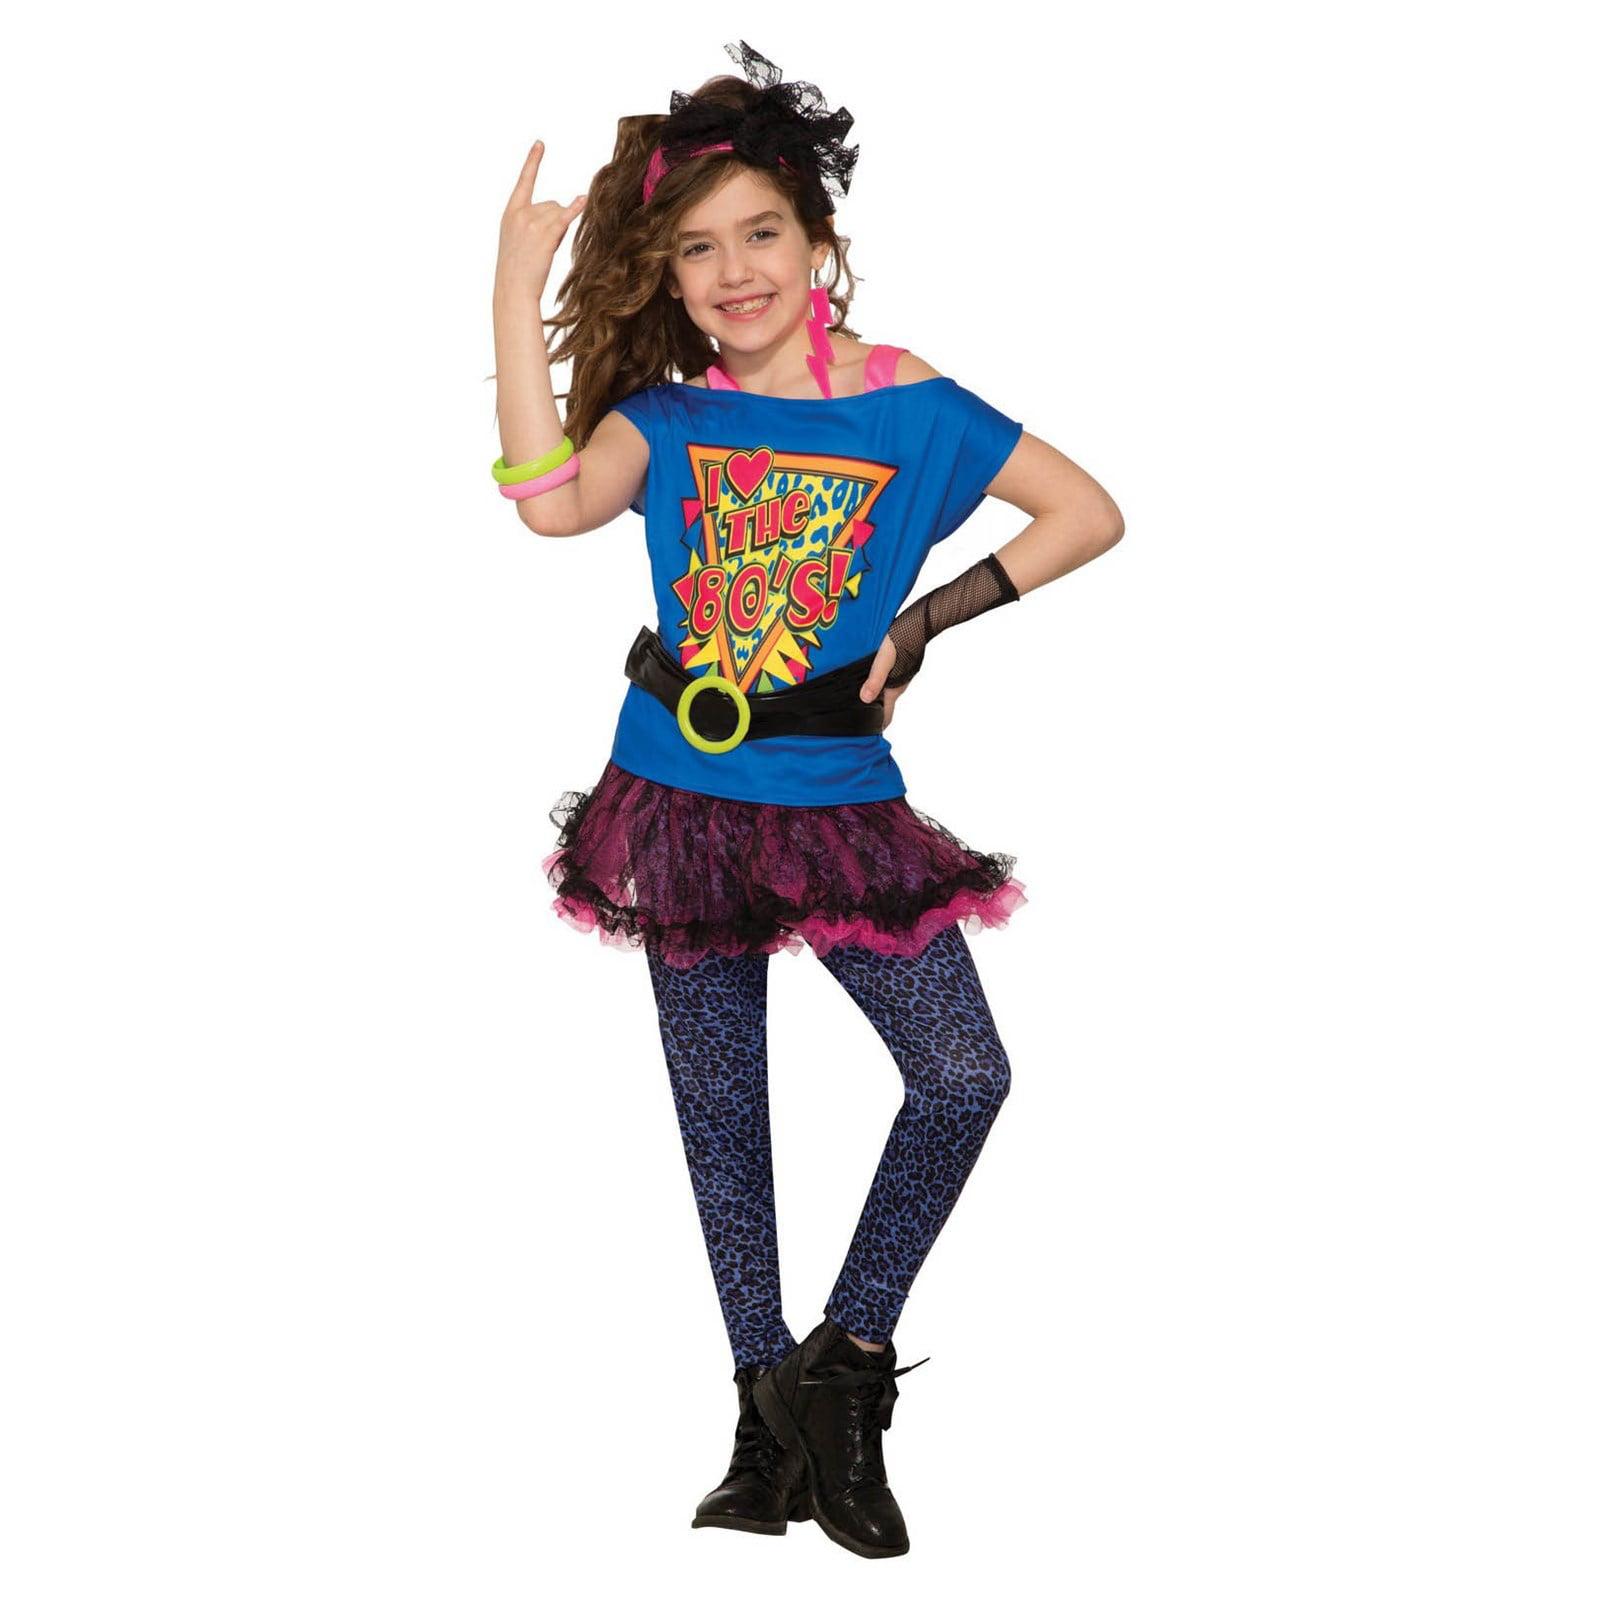 Girls Totally 80's Halloween Costume - Walmart.com - Walmart